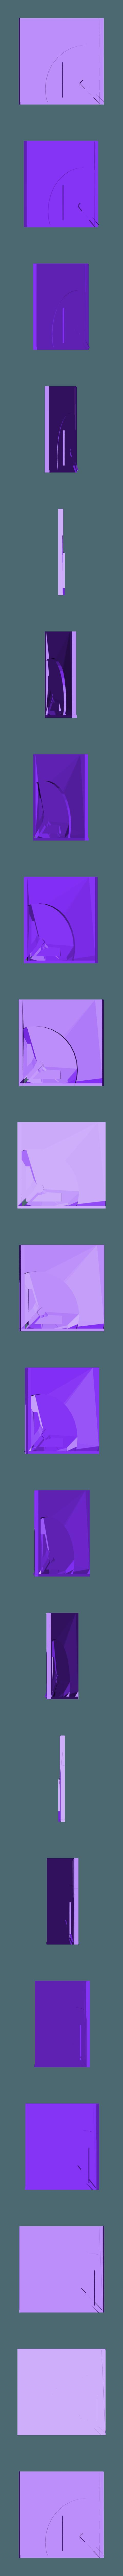 base baseball.stl Download STL file Baseball Pikachu Salamèche carapuce • 3D printing template, Majin59